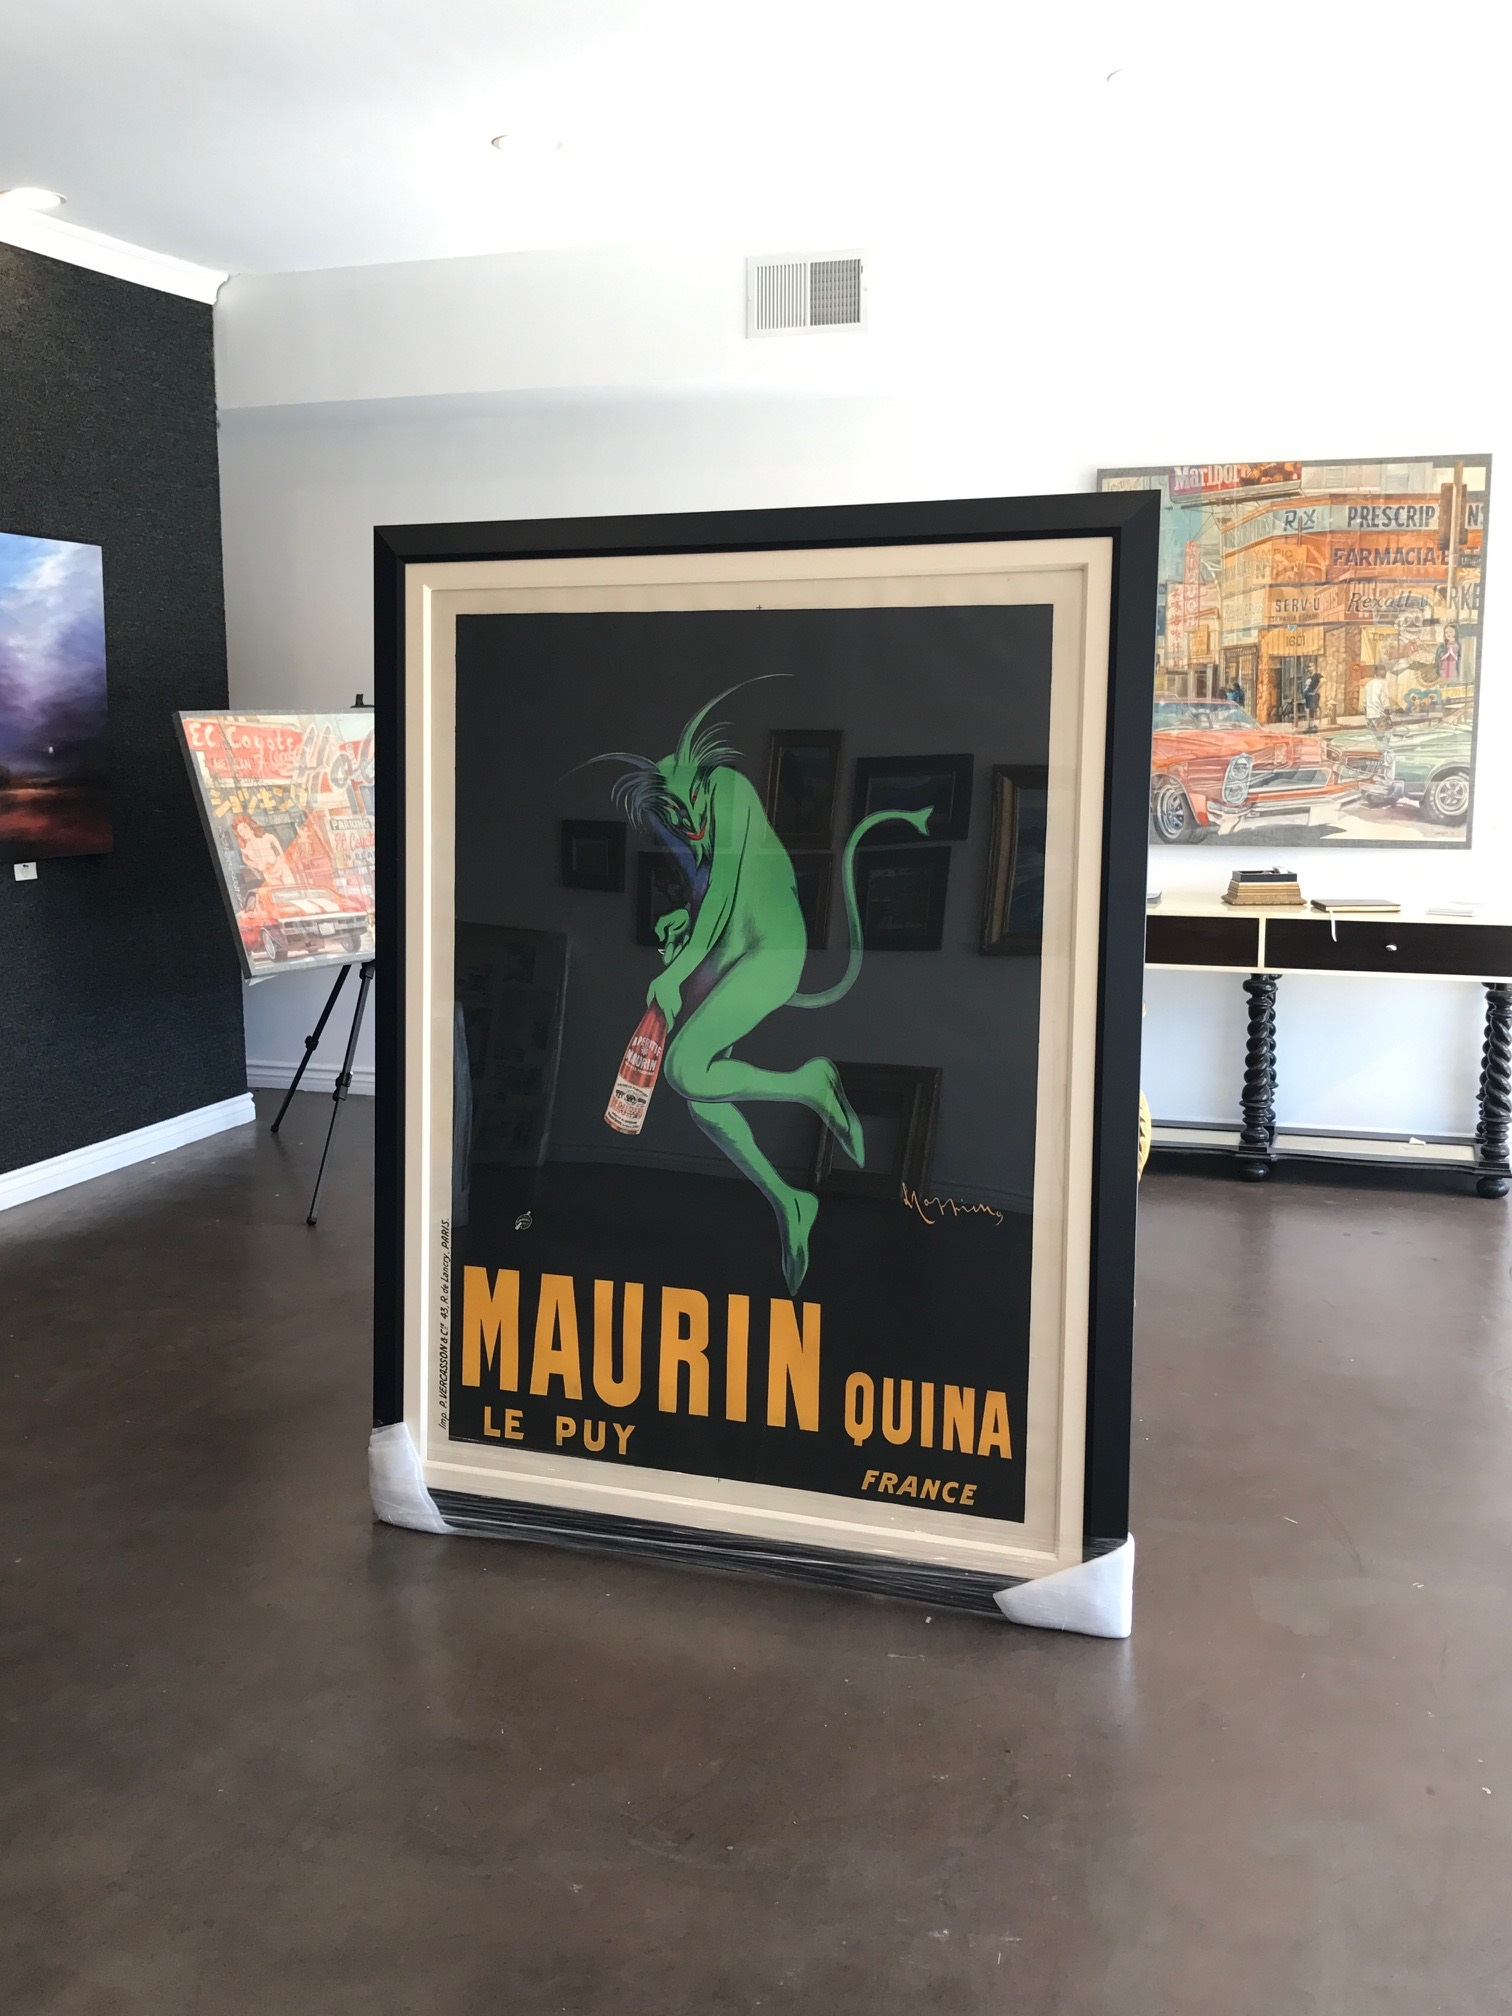 movie-poster-maurin-quna-size-55-x-72-a-aa.jpg